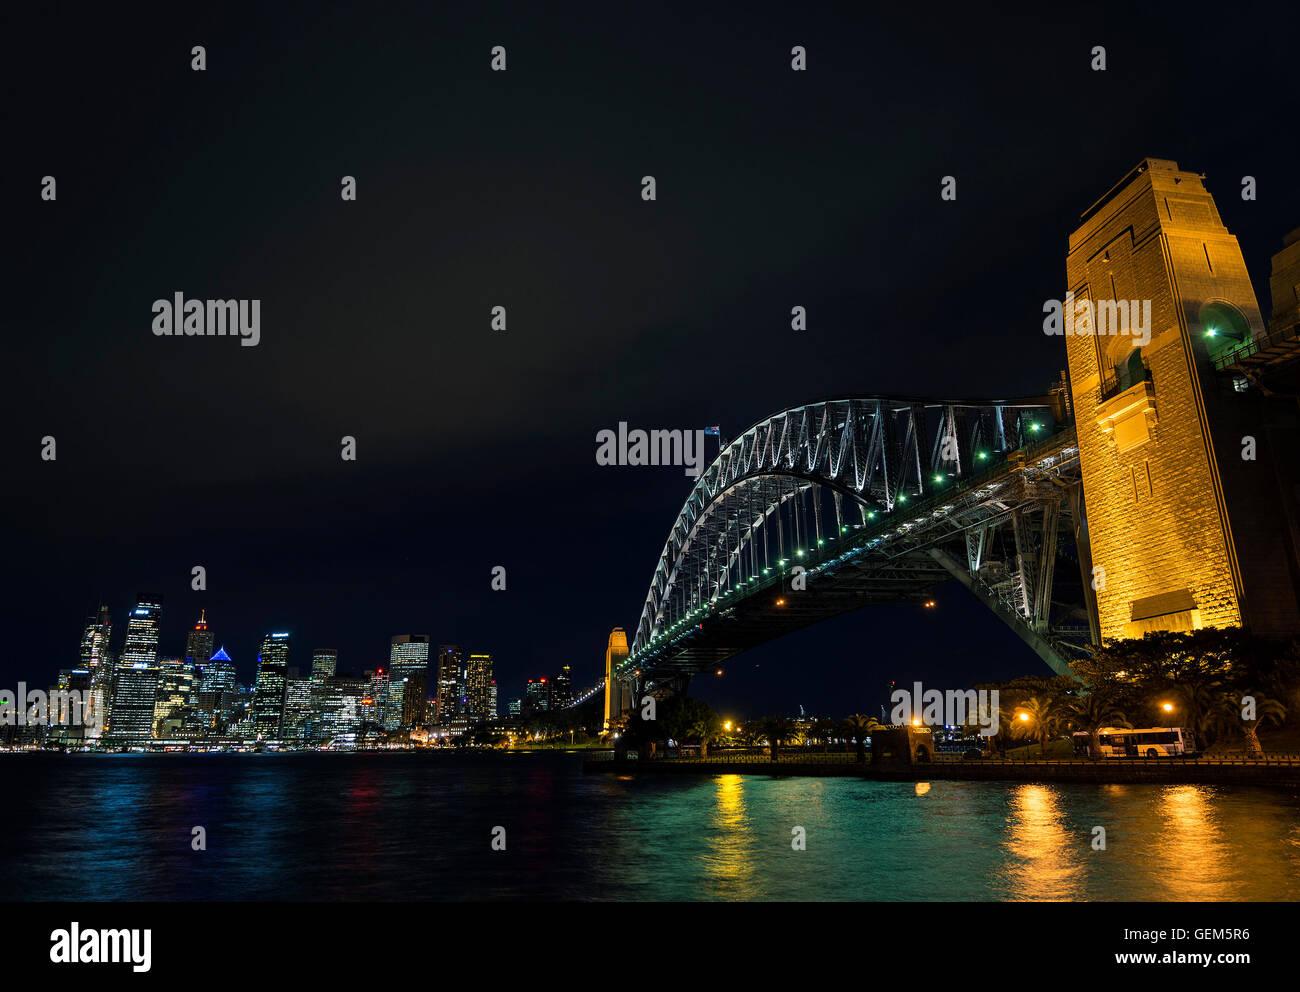 famous sydney harbour bridge and CBD skyline landmarks in australia at night - Stock Image